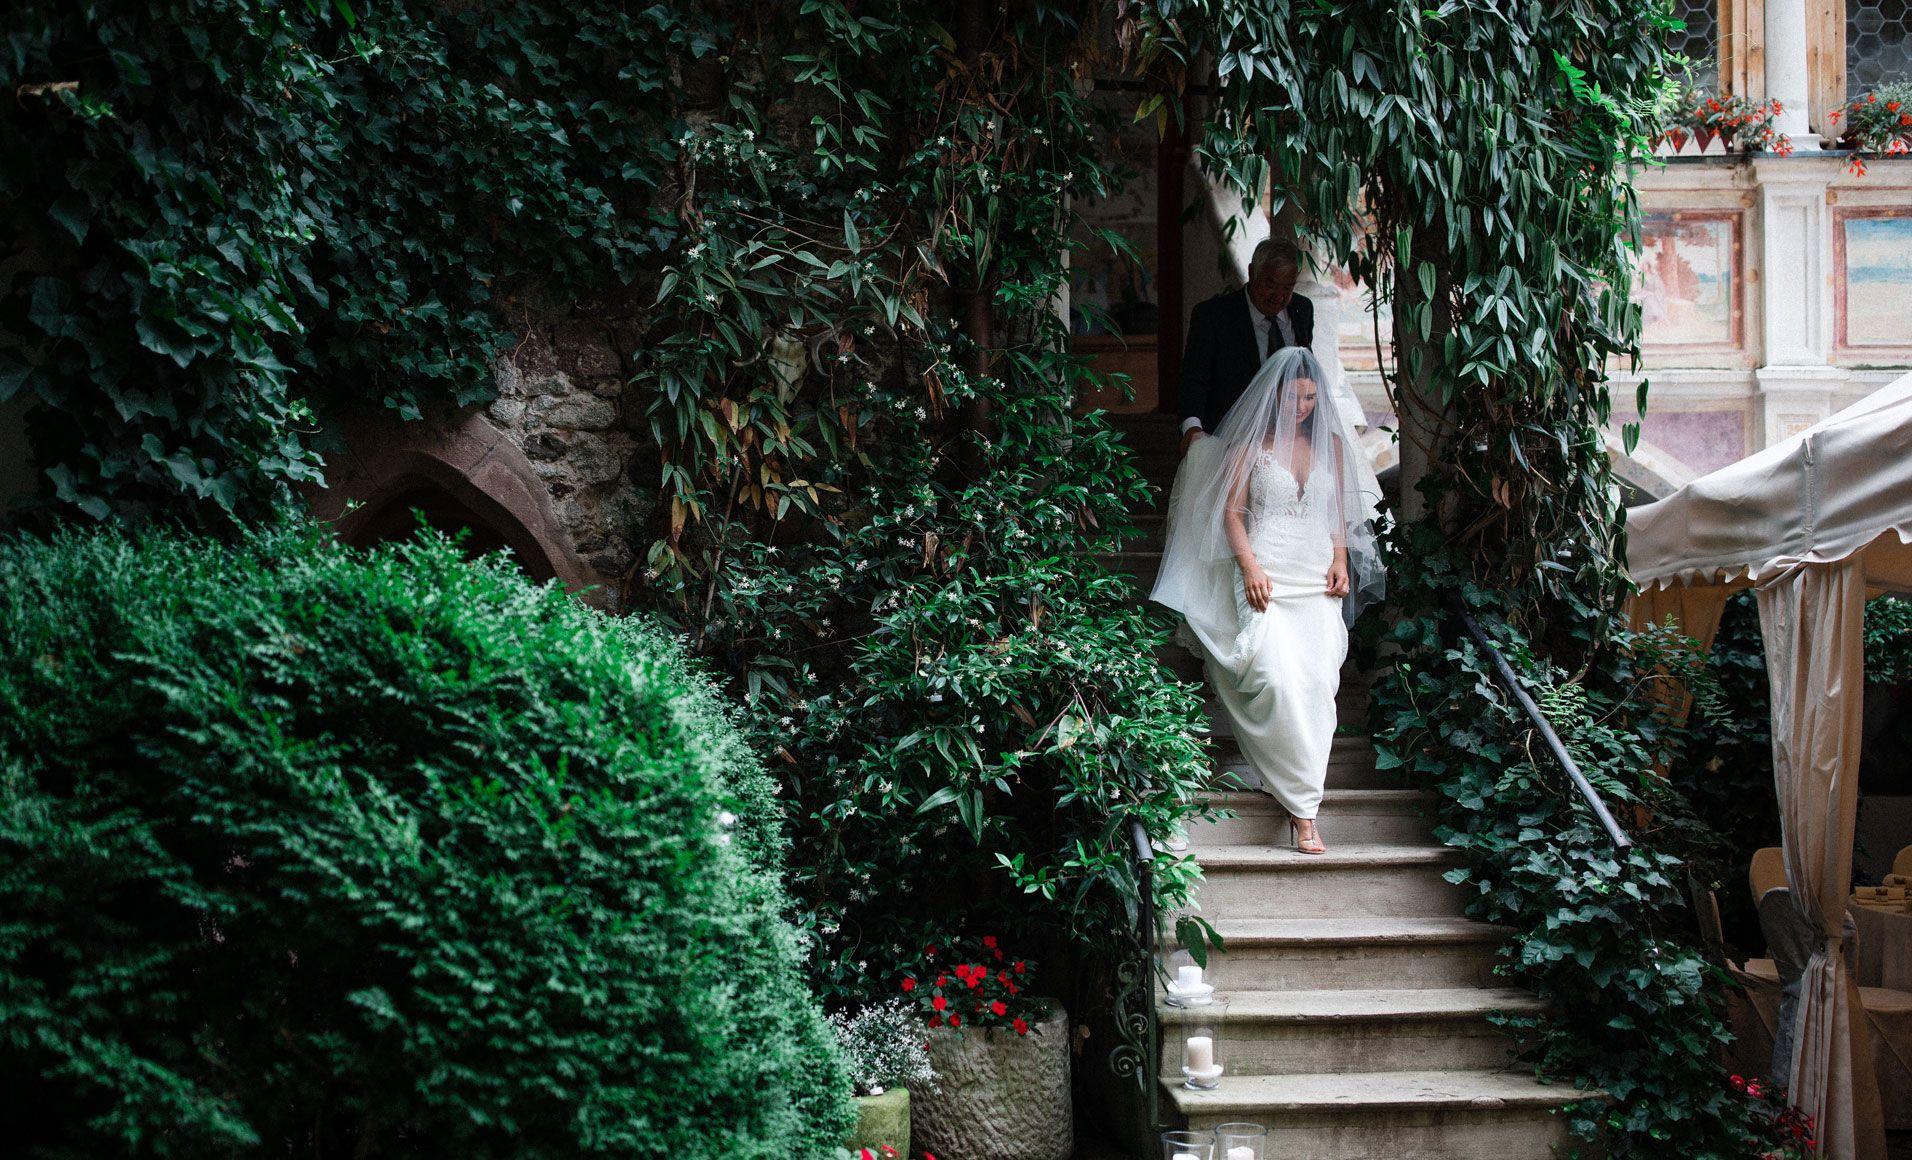 Sposarsi In Alto Adige I Dolomites Weddings I Hochzeit In Sudtirol I Catering Sudtirol Hannah Elia In 2020 Hochzeit Catering Sudtirol Italien Bozen Sudtirol